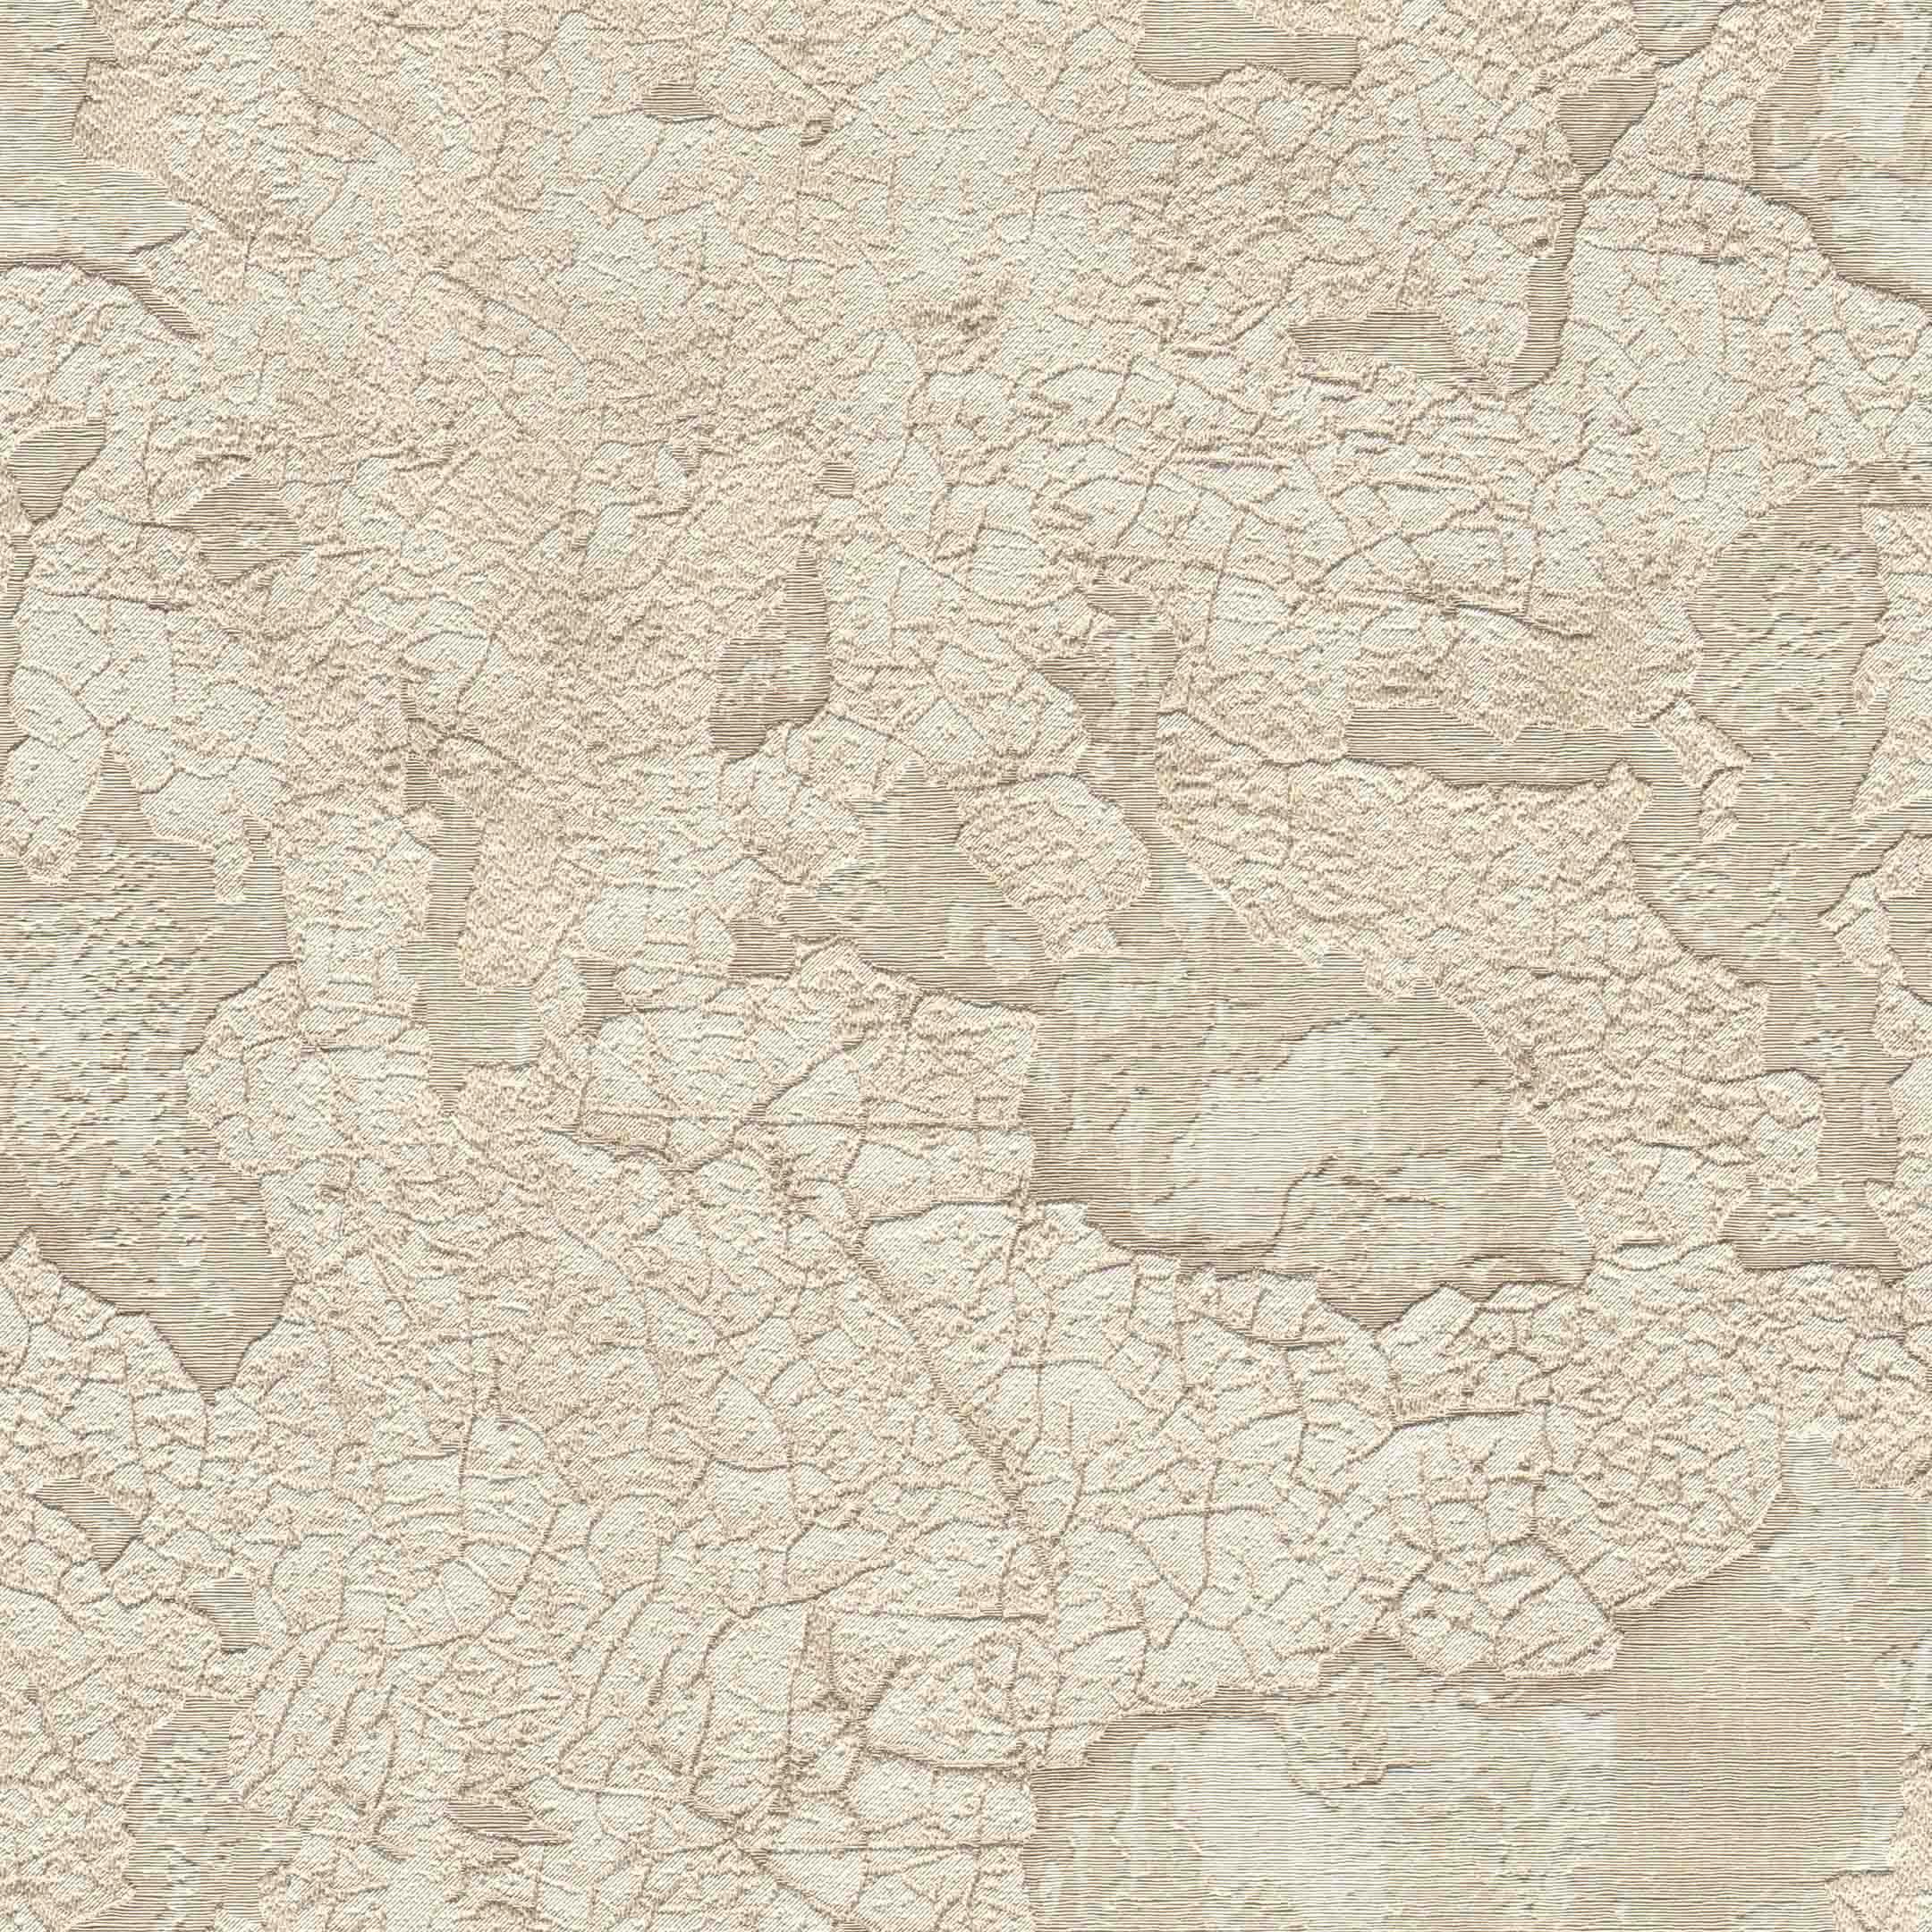 цена на Обои виниловые на флизелиновой основе Zambaiti Murella Moda M53047 (1,06х10,05 м)